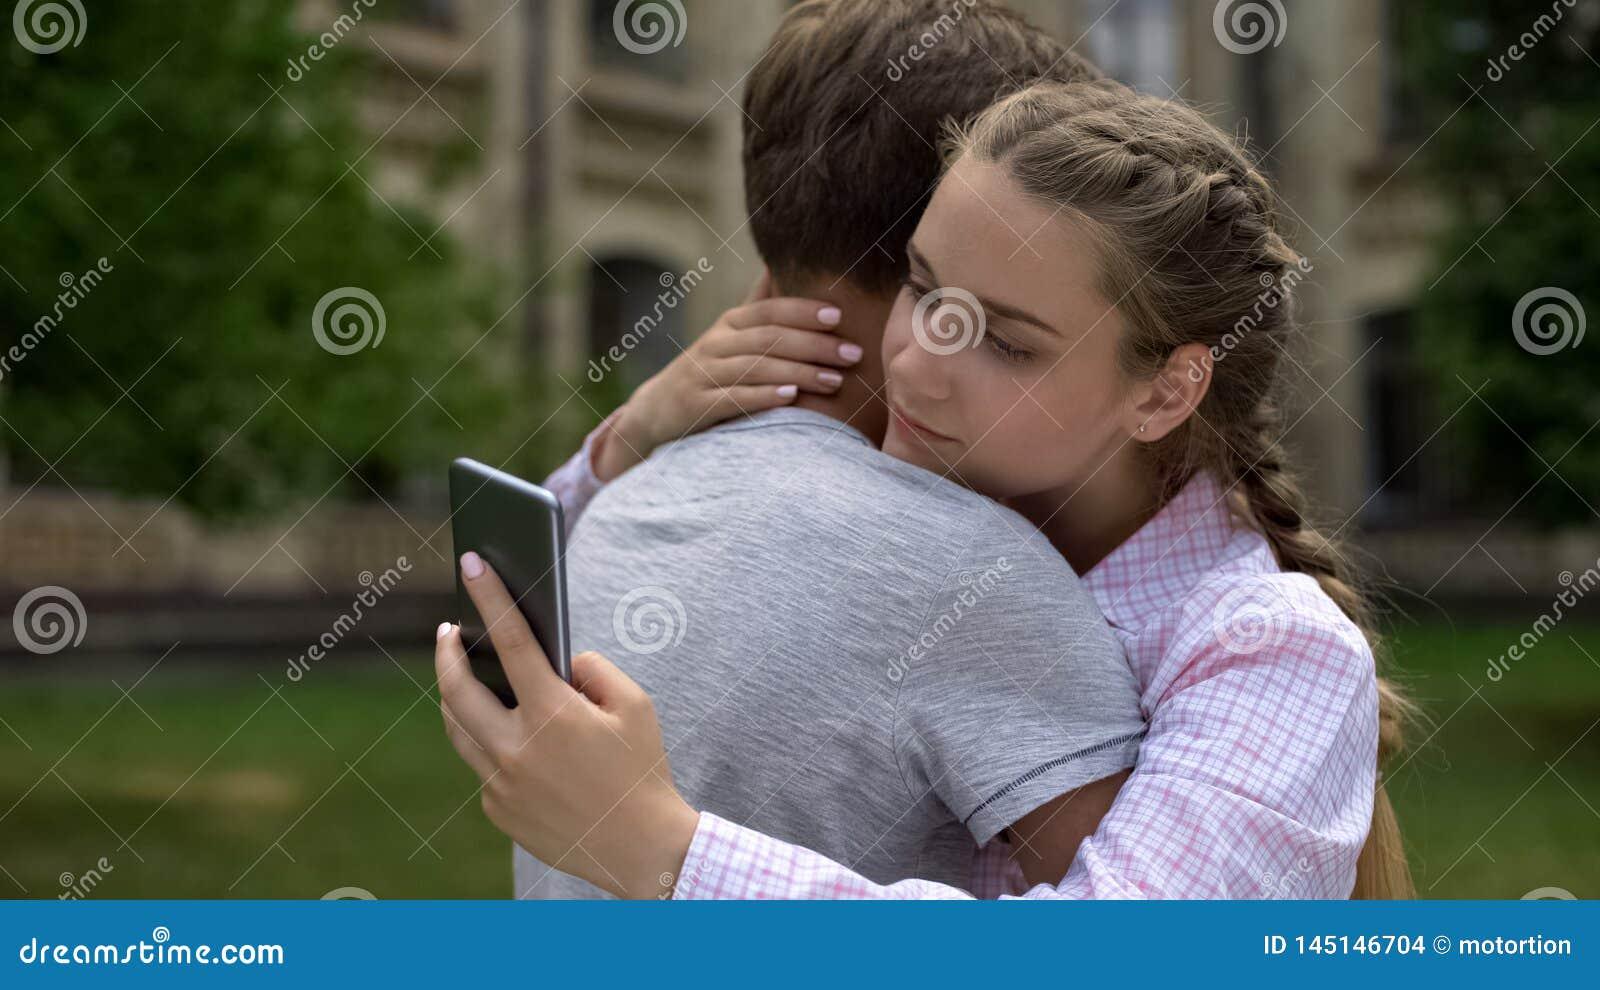 Tienermeisje die telefoon met behulp van, die vriend in plaats van echte mededeling, concept koesteren